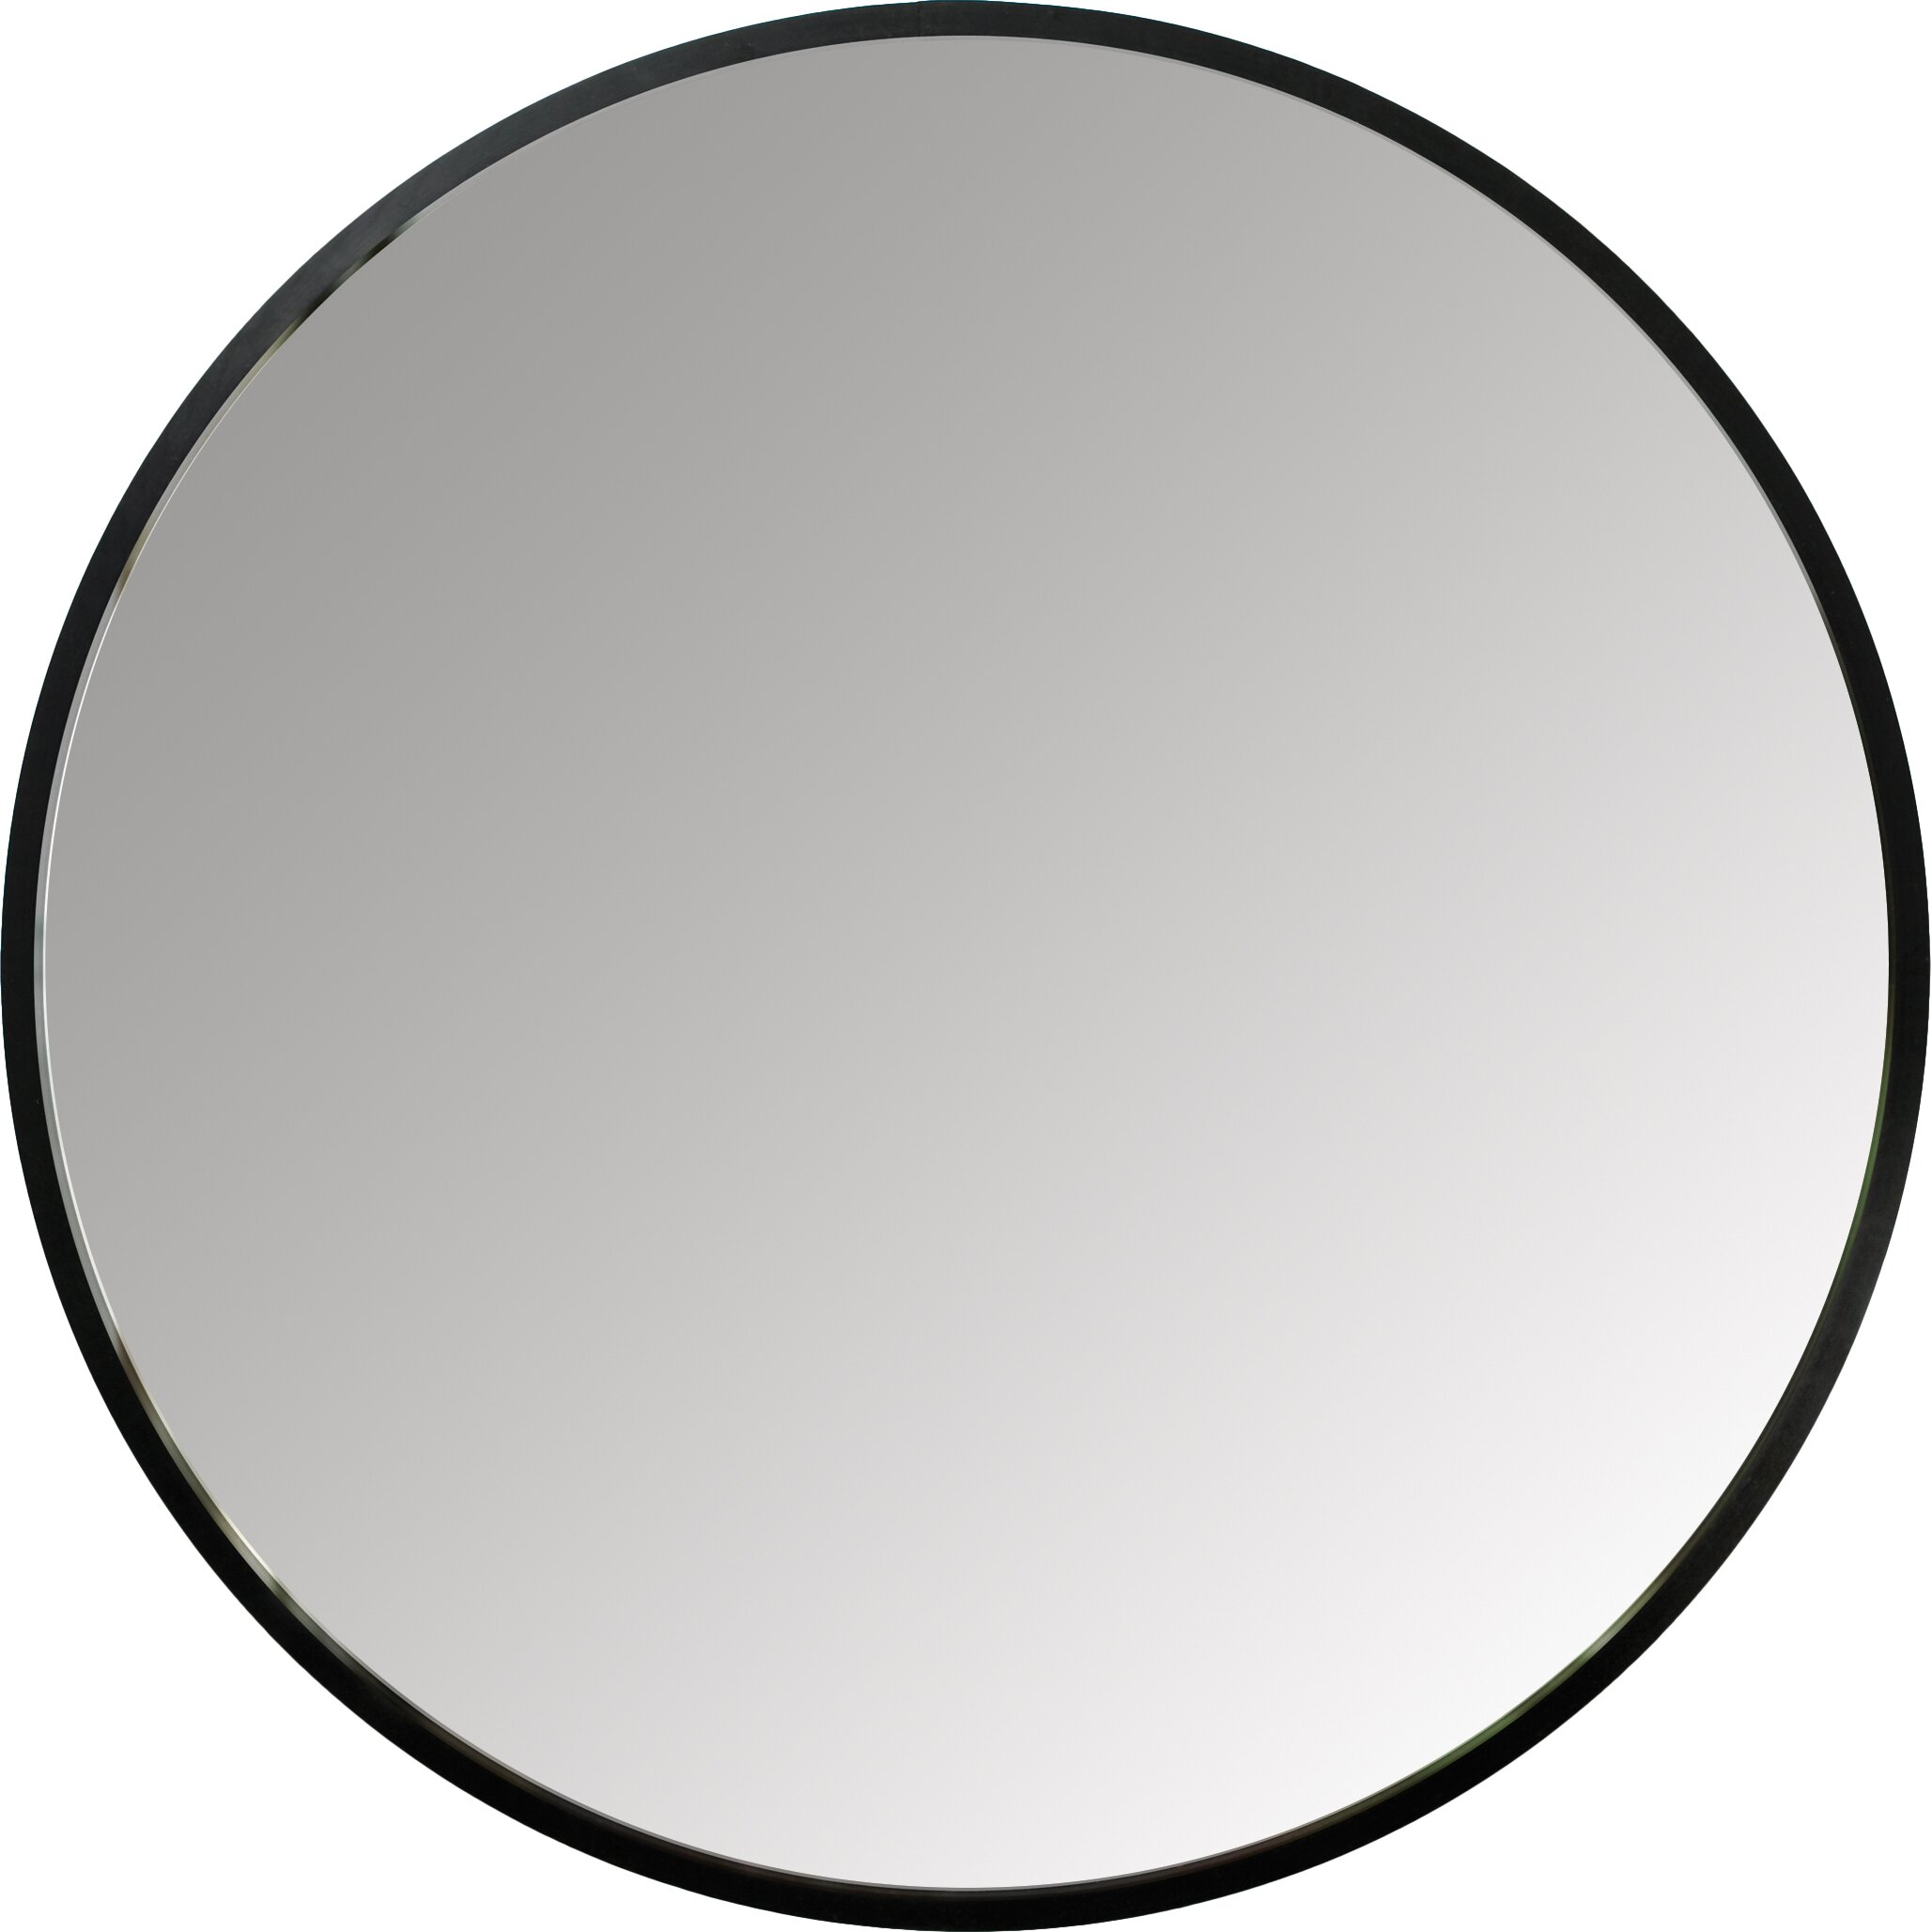 Umbra hub wall mirror reviews wayfair for Miroir umbra